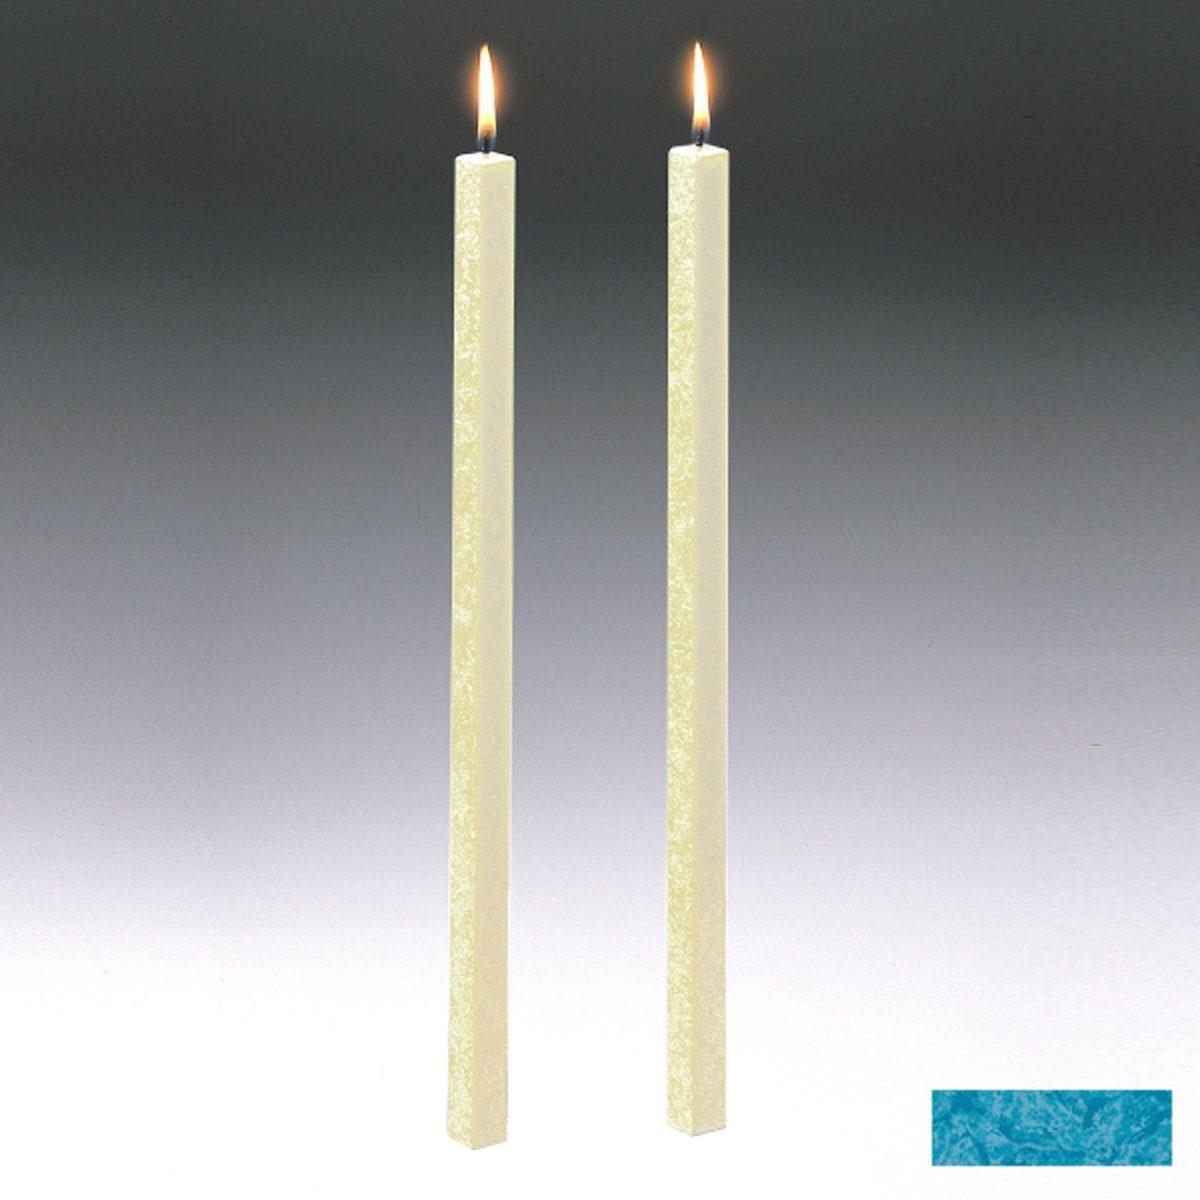 Amabiente Amabiente Kerze CLASSIC Türkis 40cm - 2er Set